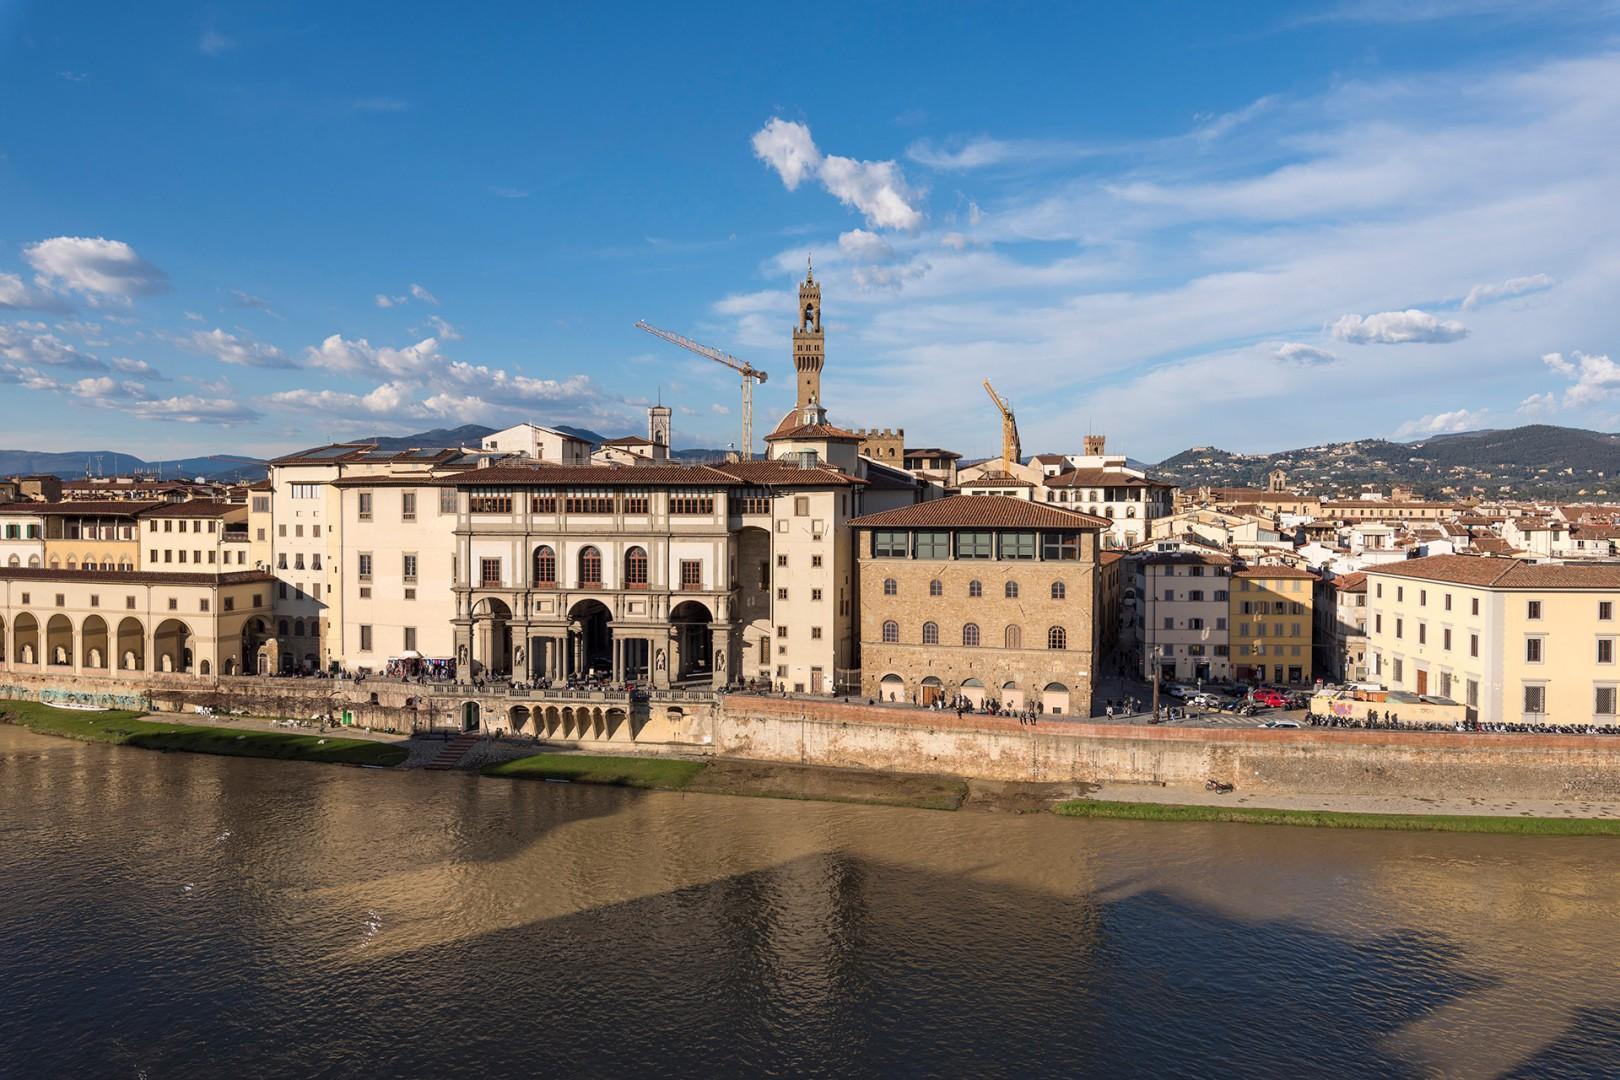 Admire the beautiful Renaissance facade of the Uffizi across the river.